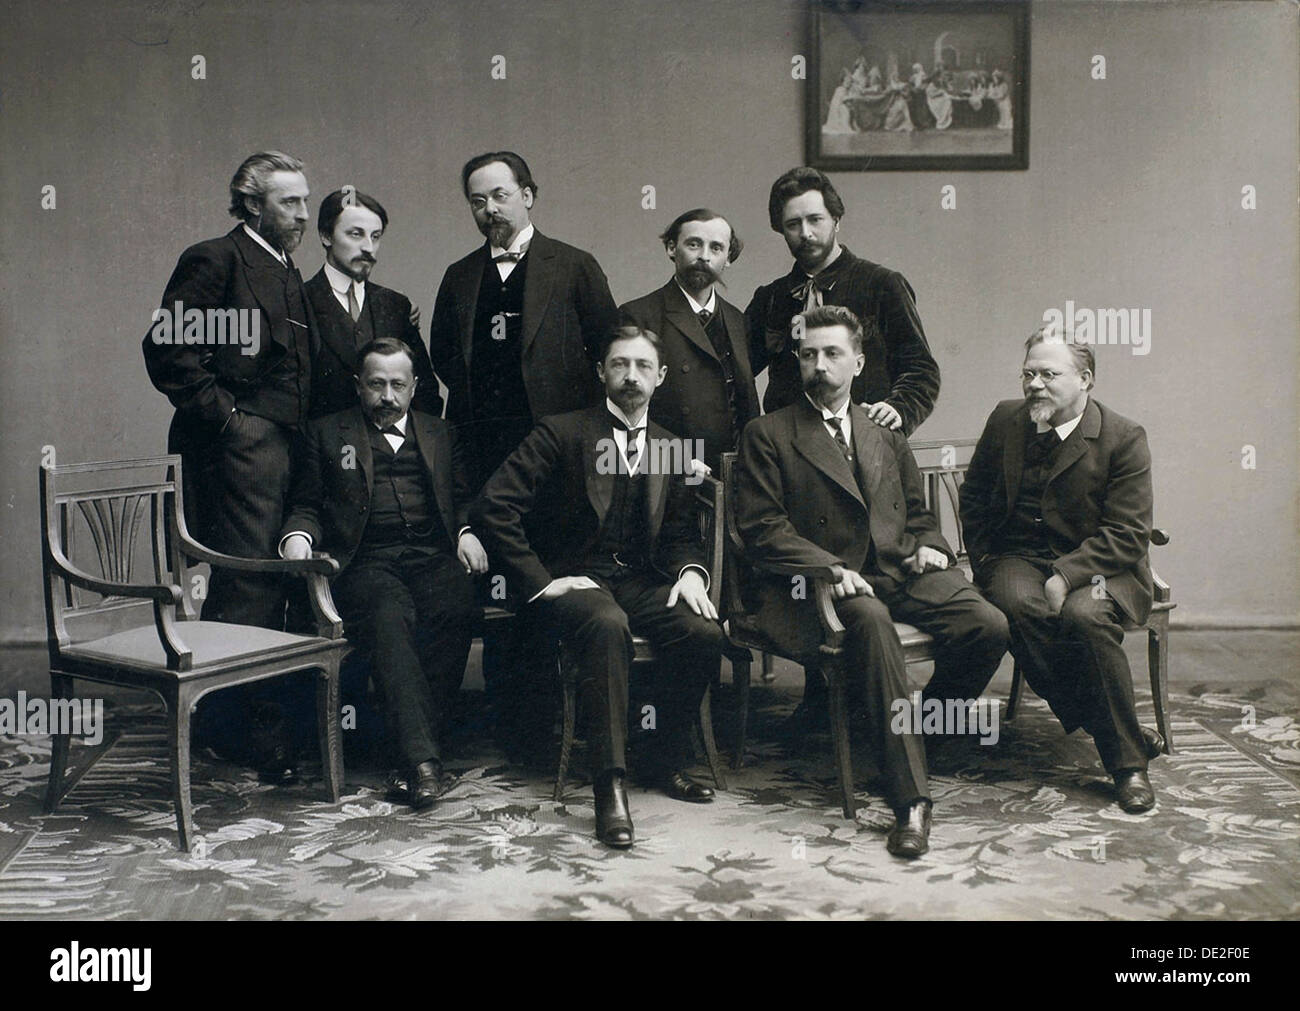 'Sreda' ('Wednesday'), Russian literary group, 1890s. - Stock Image